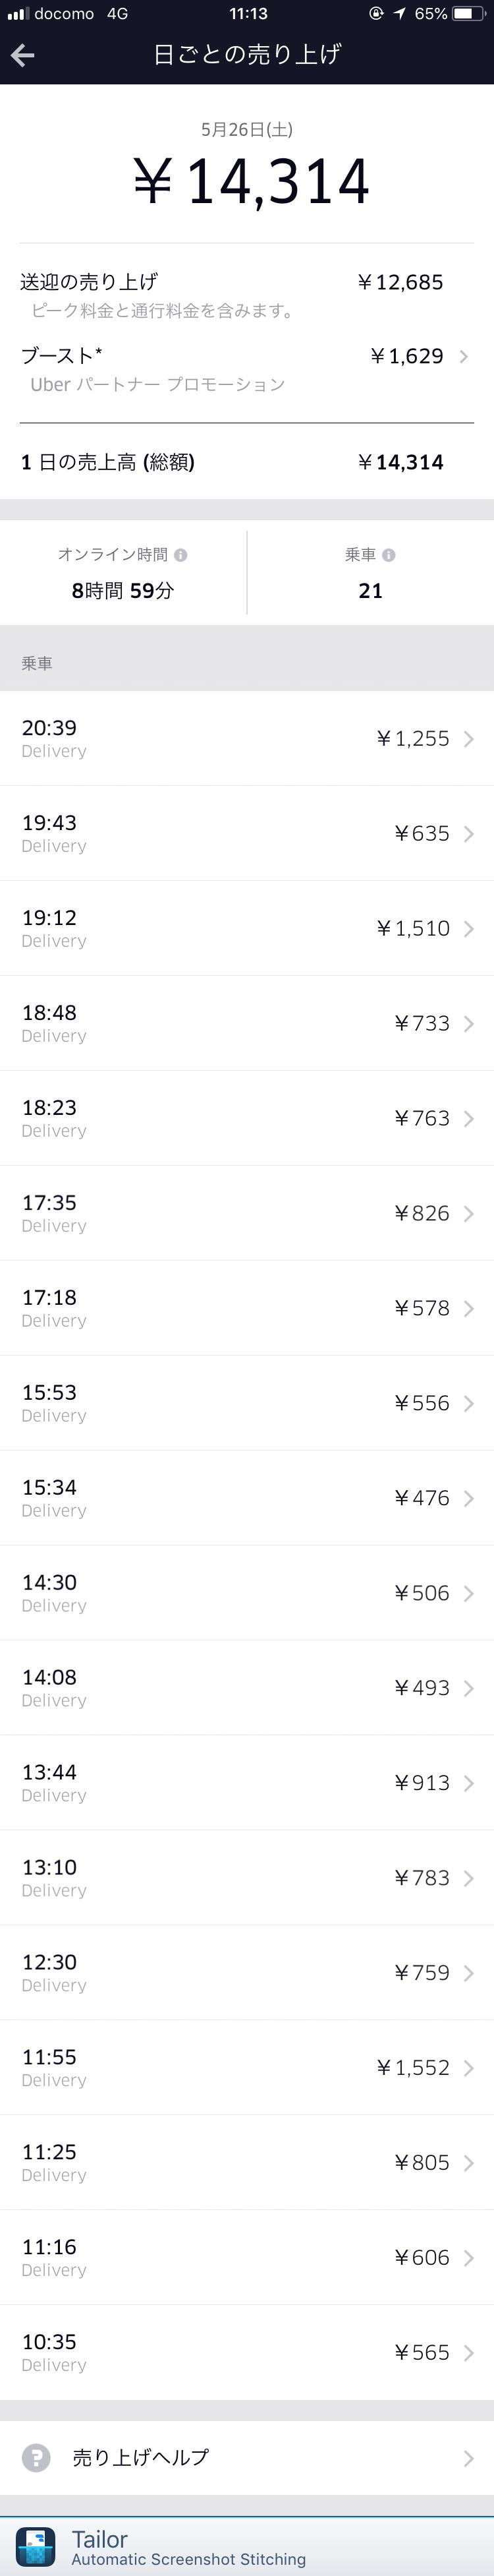 Uber Eats5月26日の配達記録